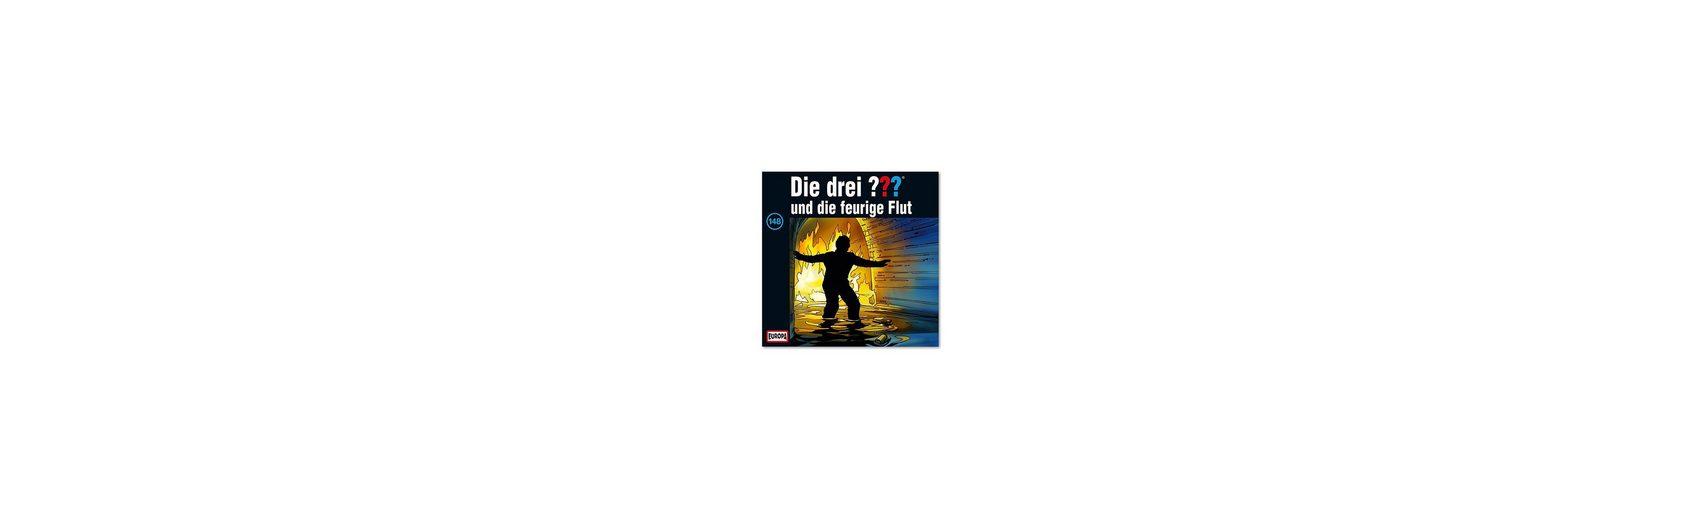 SONY BMG MUSIC CD Die drei ??? 148 - und die feurige